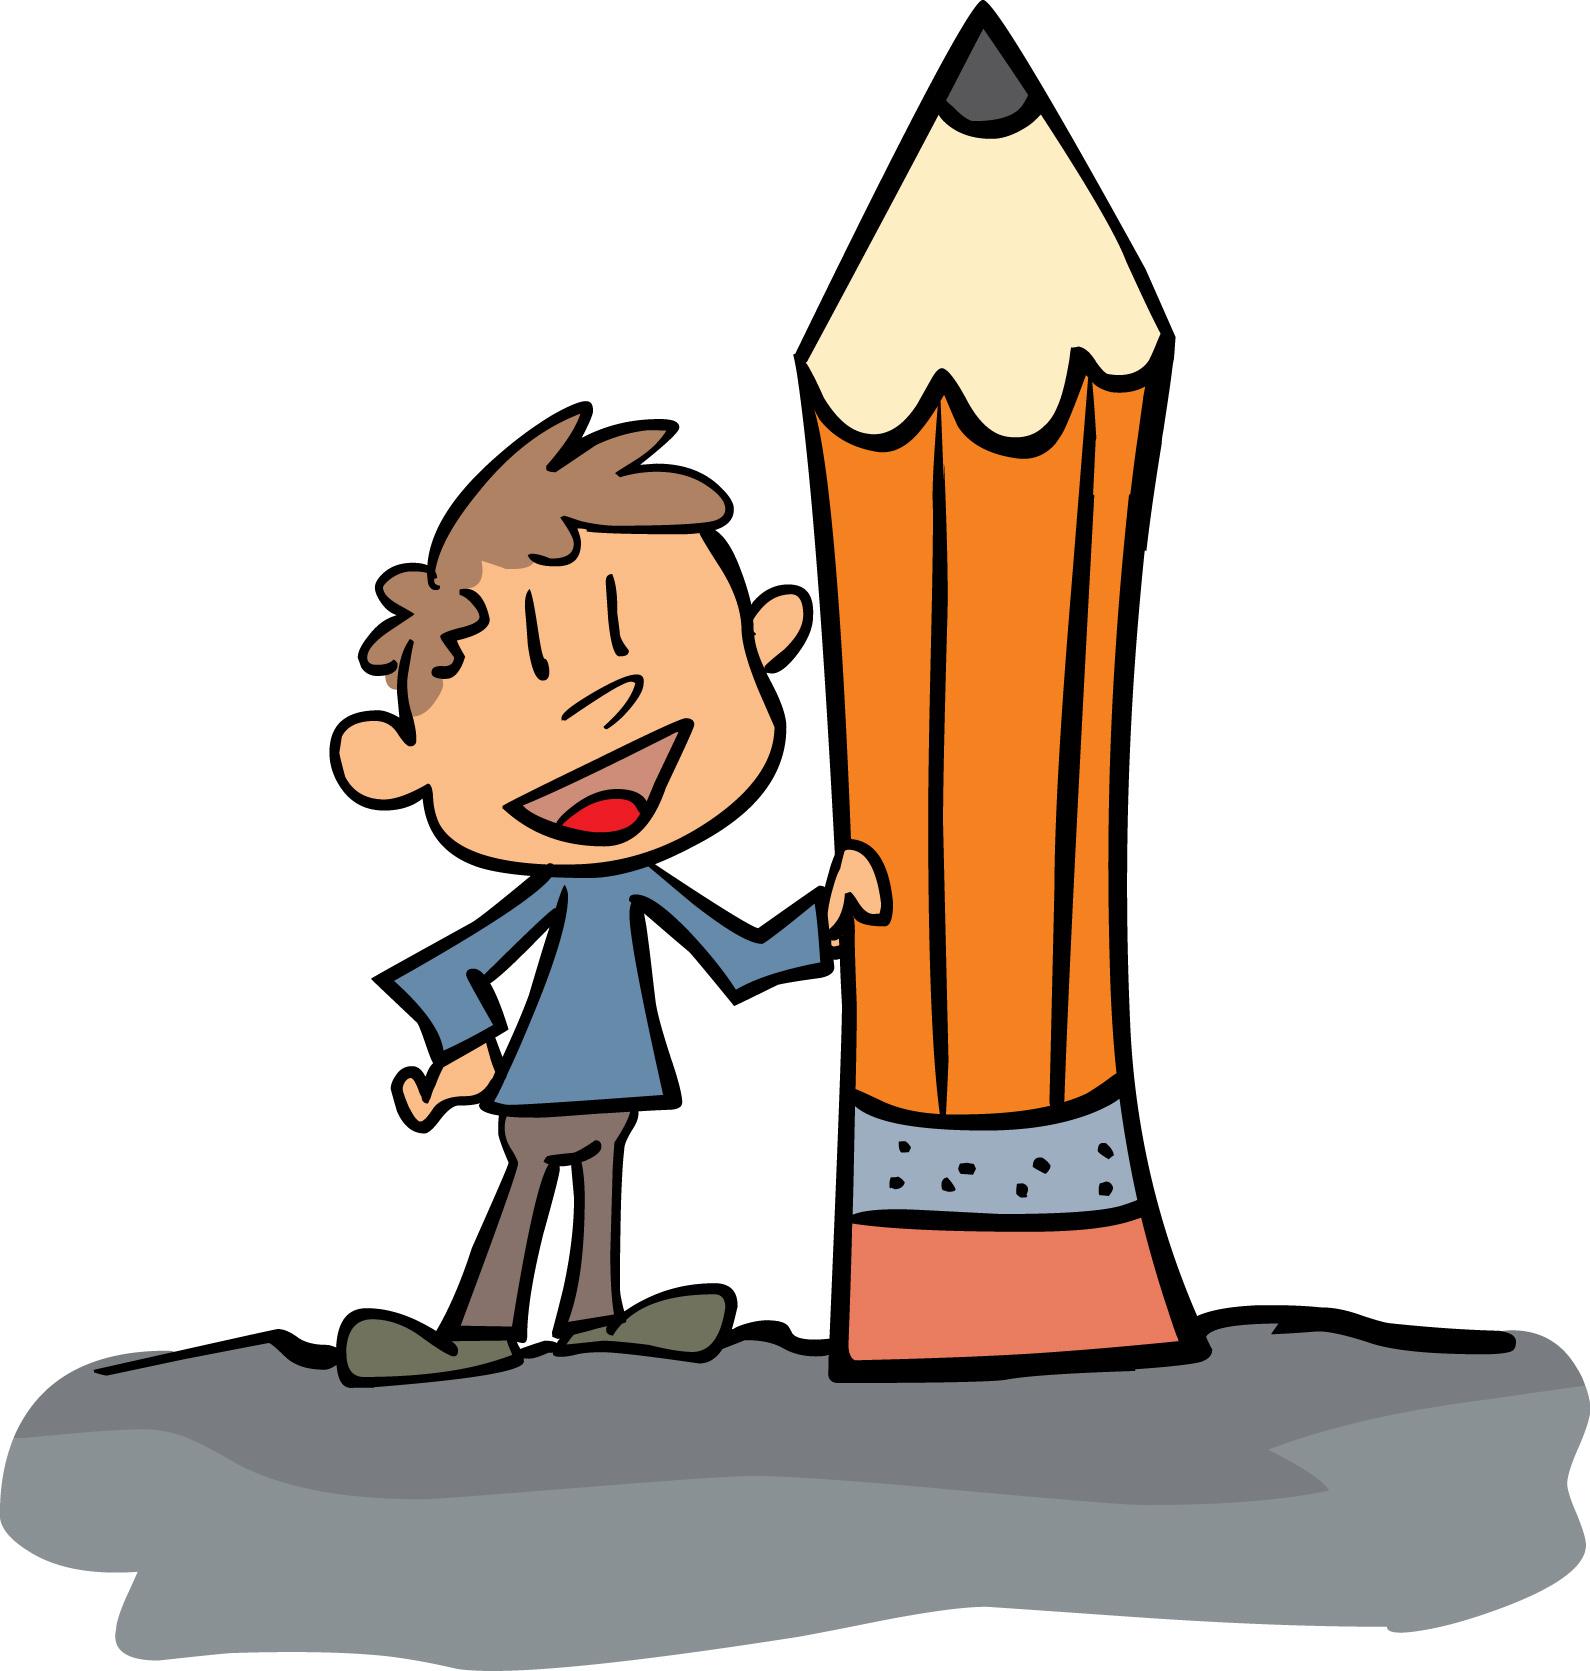 hight resolution of free animated school clip art